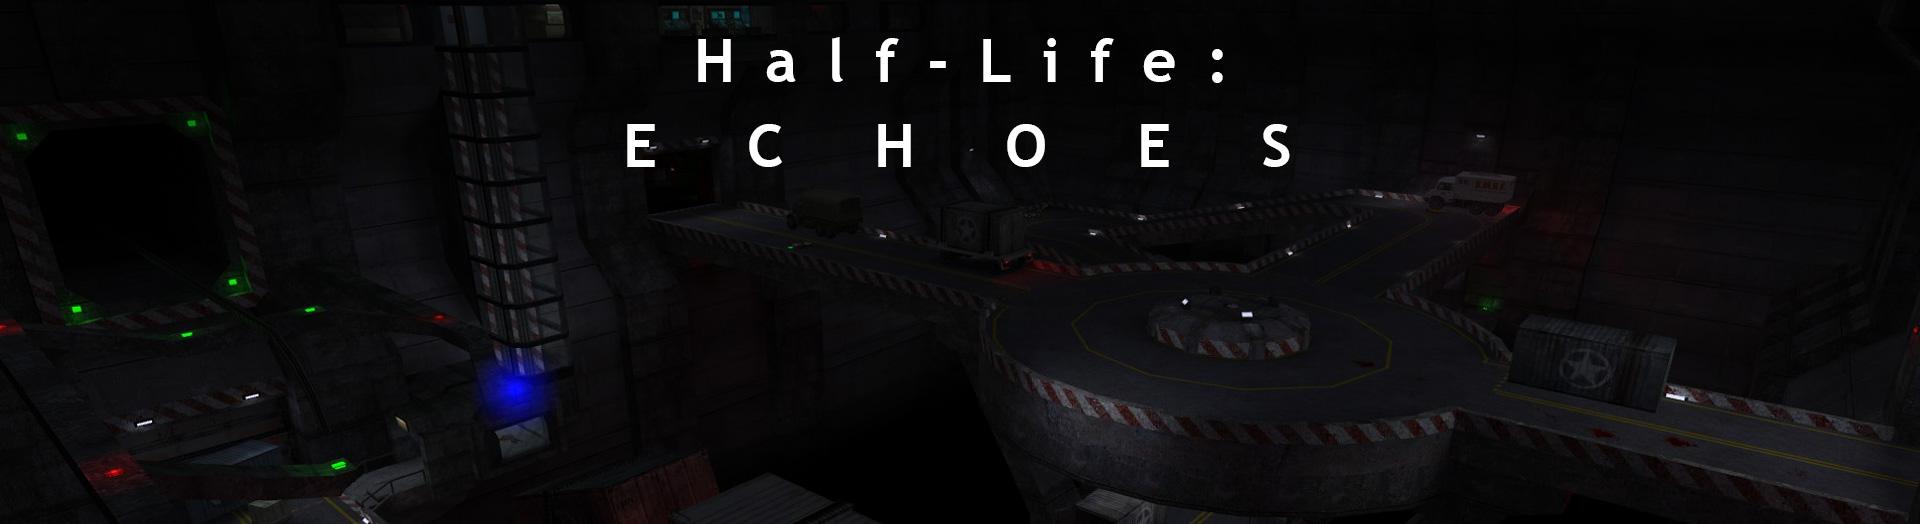 Half-Life: Echoes